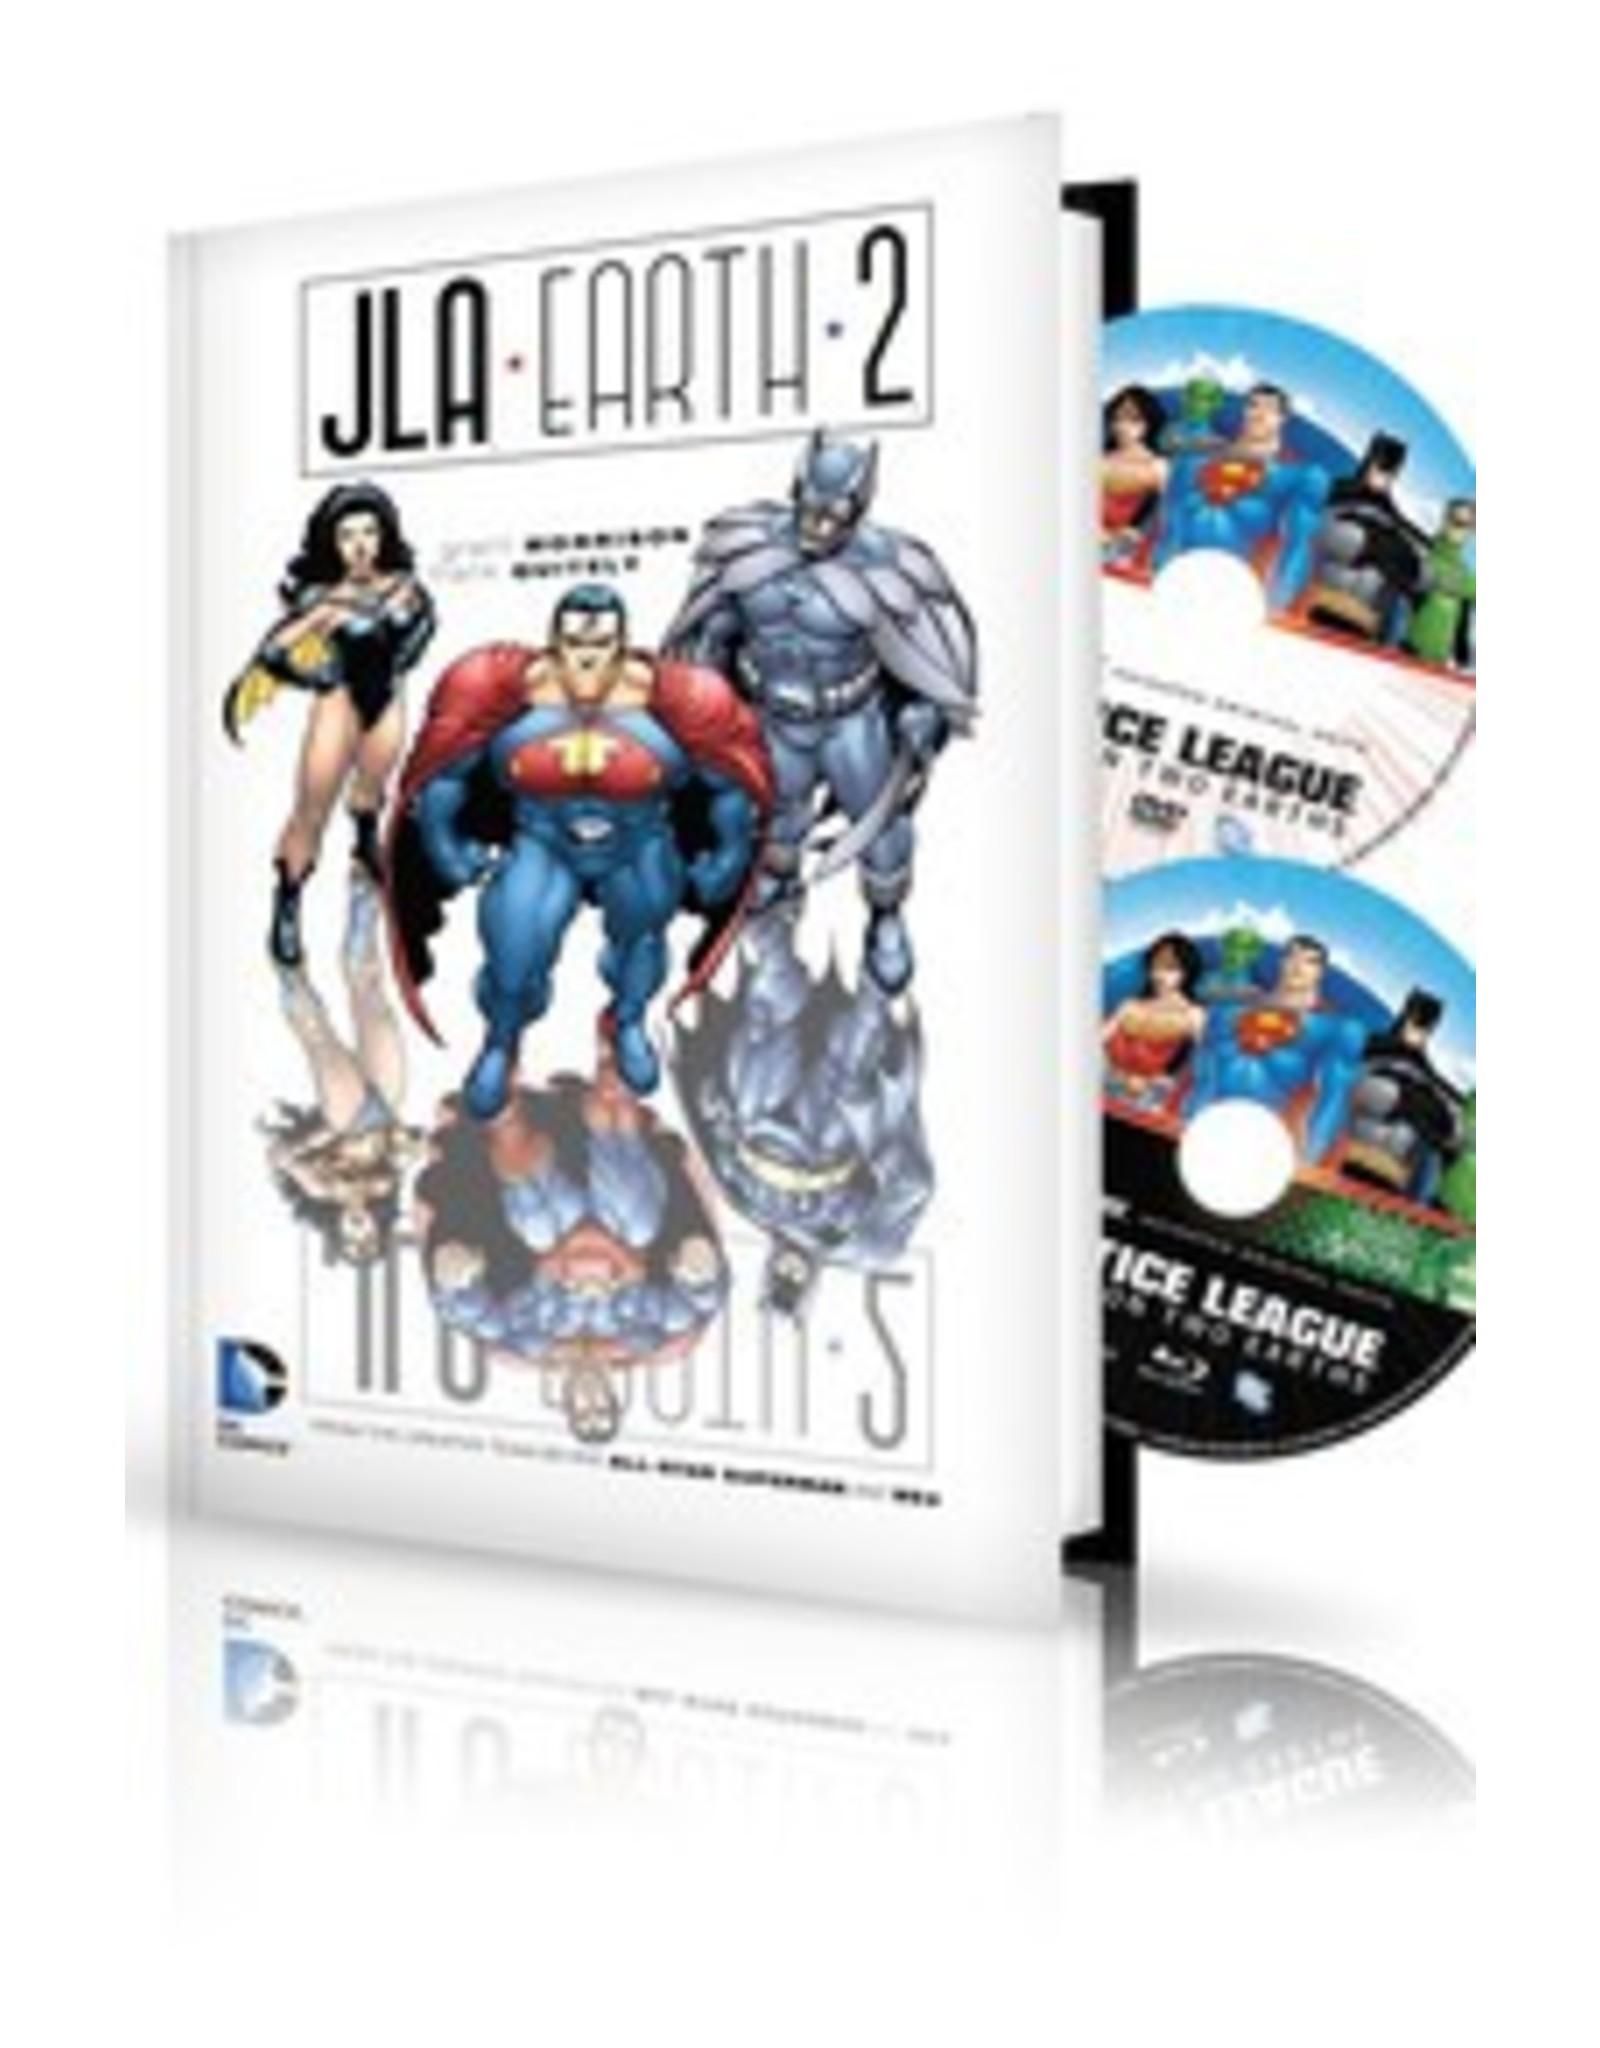 DC COMICS JLA EARTH 2 HC BOOK & DVD BLU RAY SET